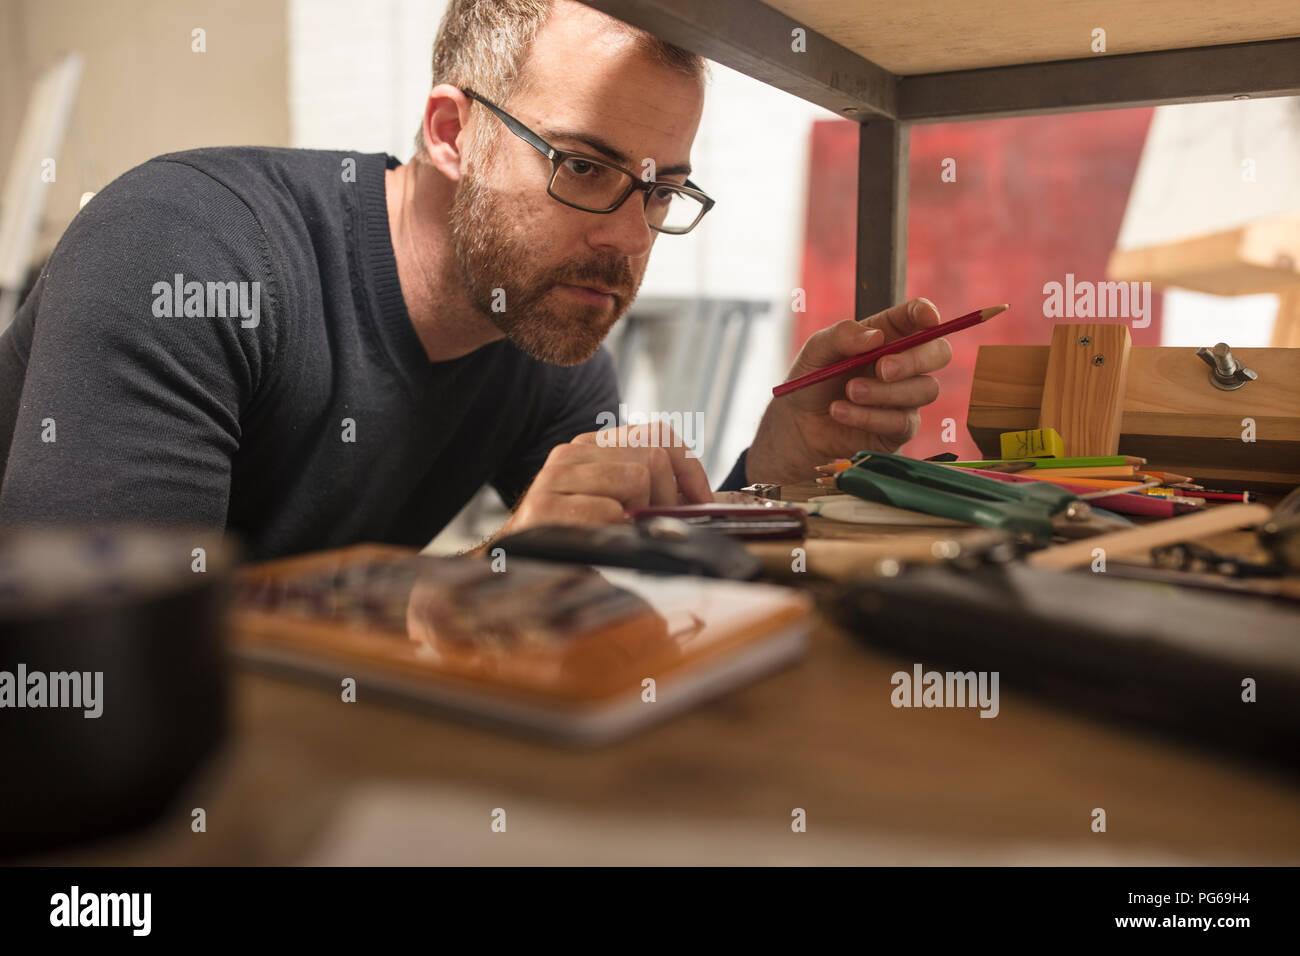 Mann in Artist's Studio Zubehörstatus Stockbild